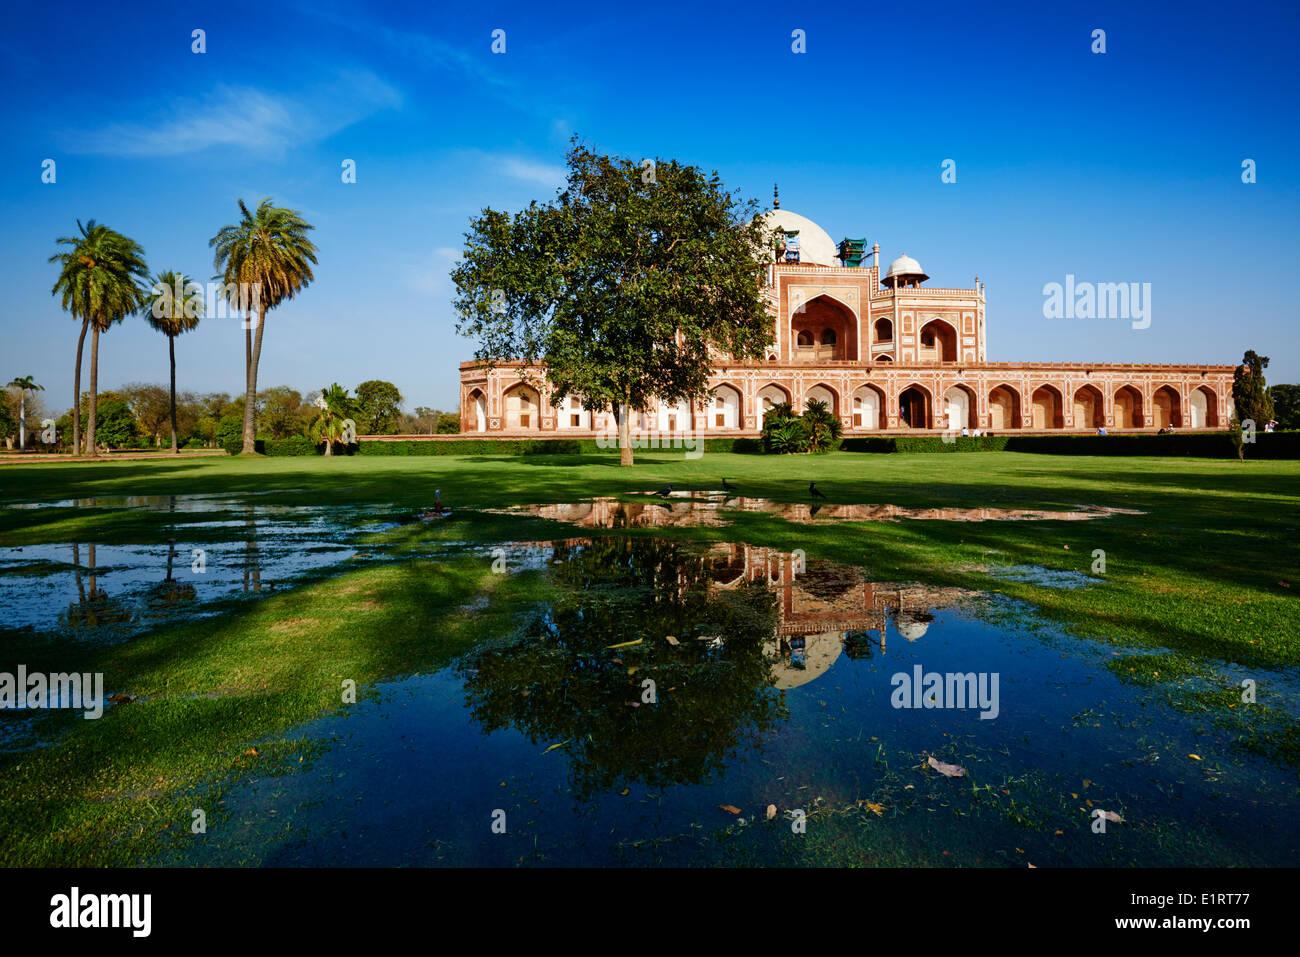 La India, Delhi, el Mausoleo de Humayun, patrimonio mundial de la Unesco Foto de stock